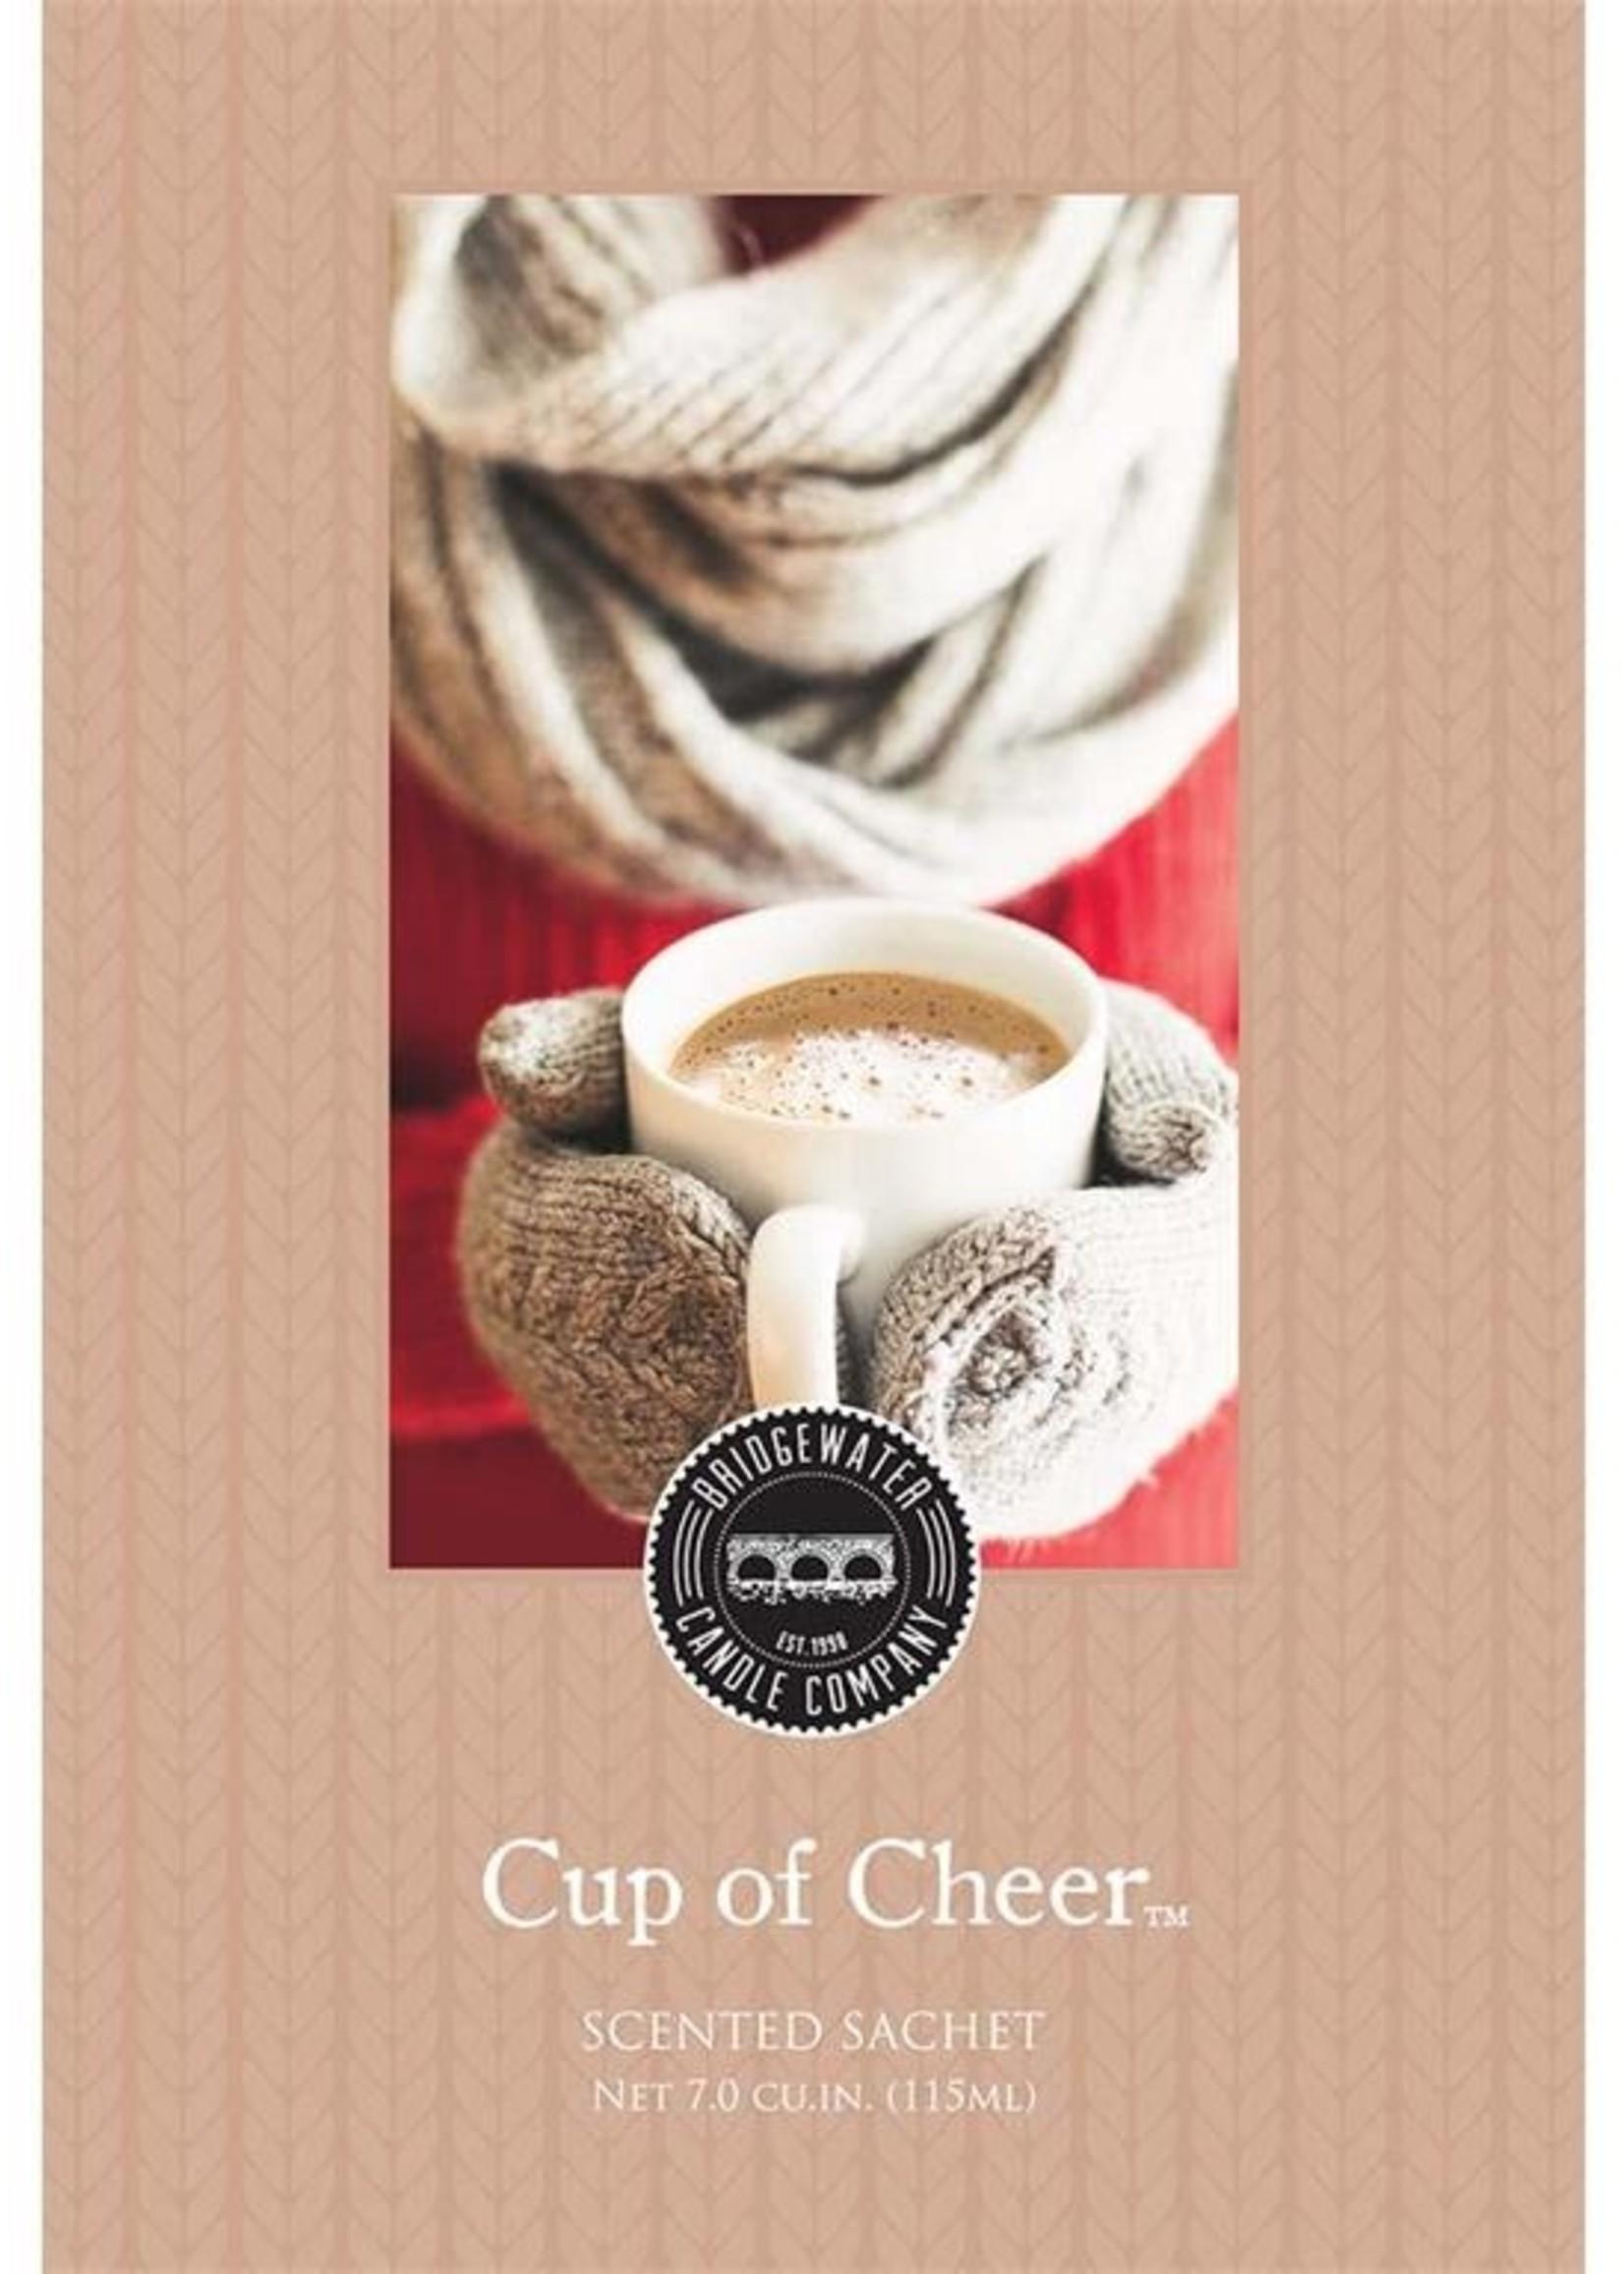 Bridgewater Sachet Cup of cheer